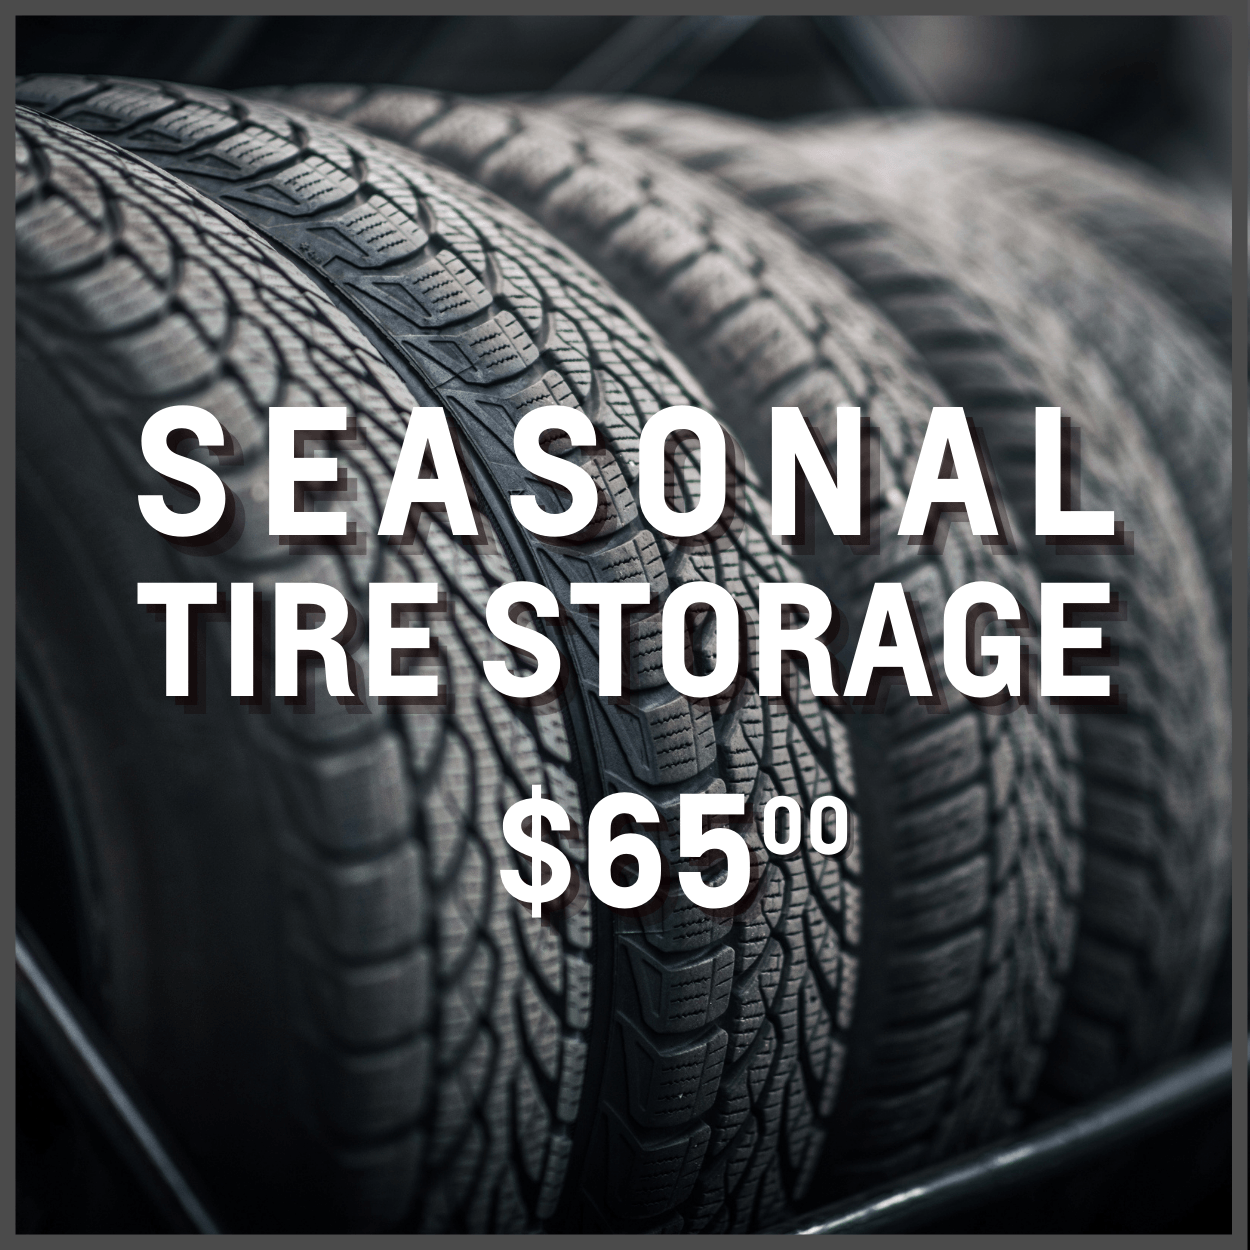 Tire storage in Oshawa